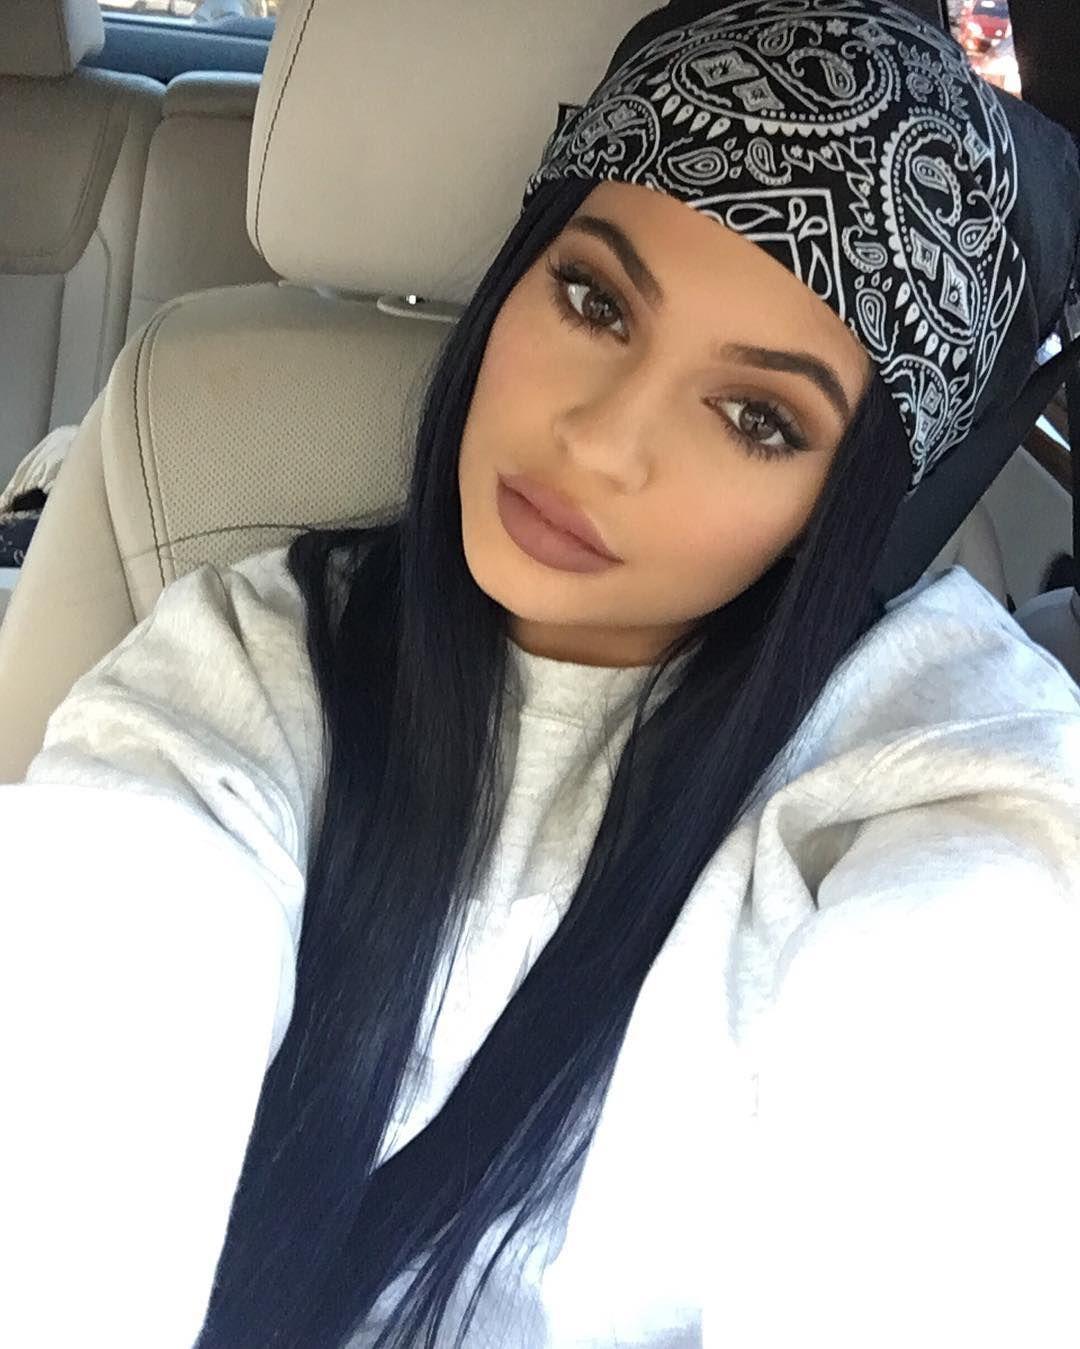 Kylie Jenner lip gloss | Kylie lipgloss, Kylie jenner lips